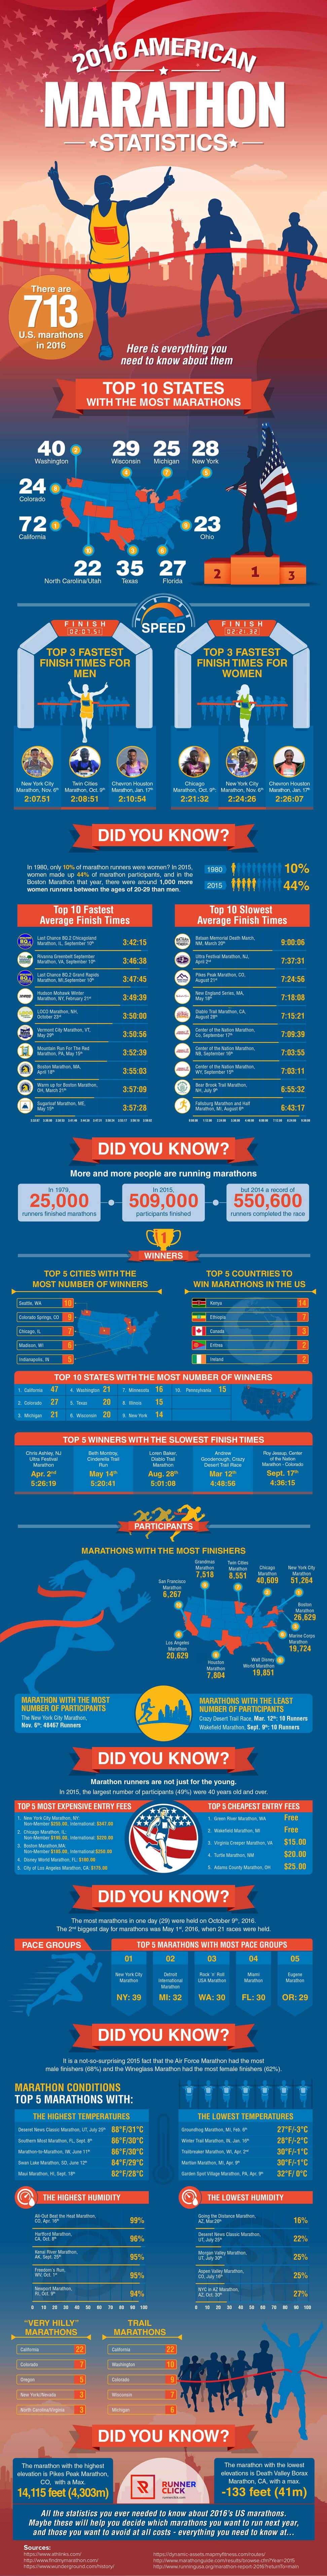 American Marathon 2016 Statistics